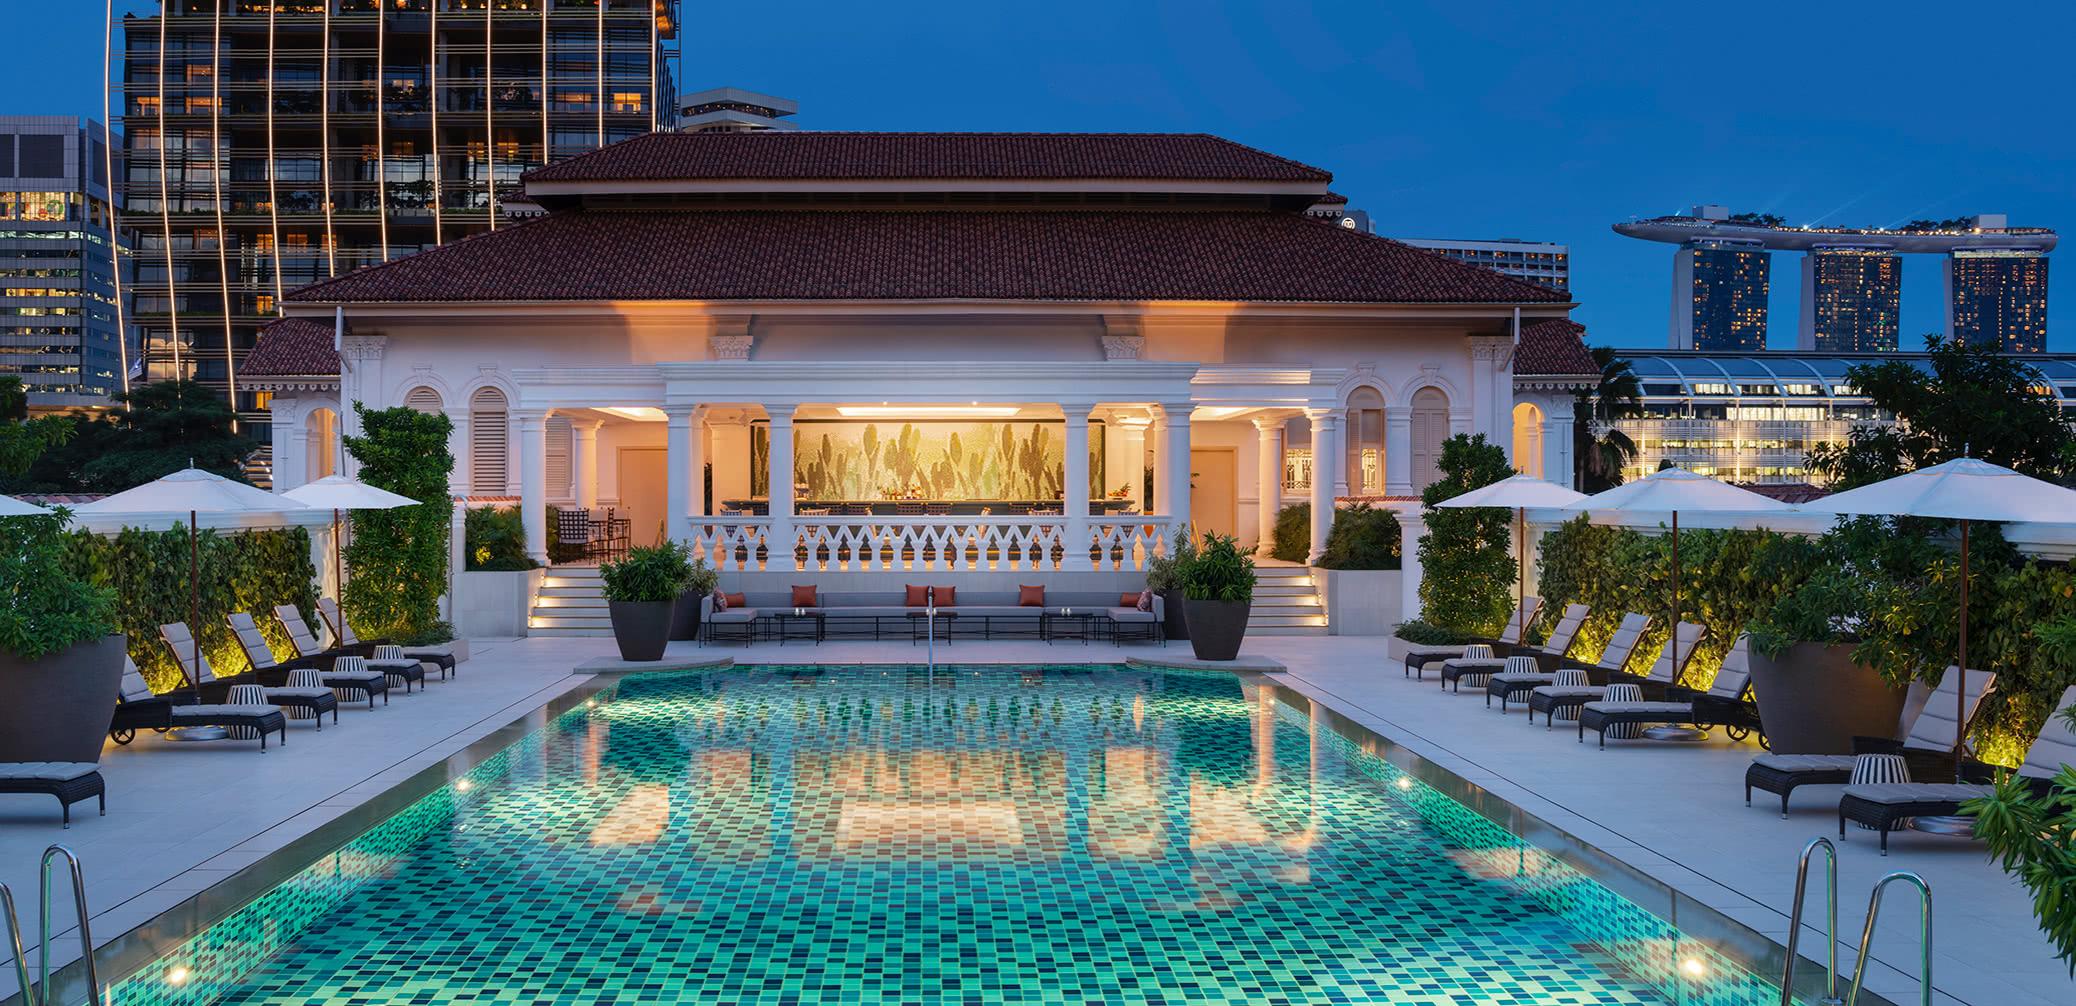 Best Luxury Hotel In Singapore: Four Seasons Vs Marina Bay Sands